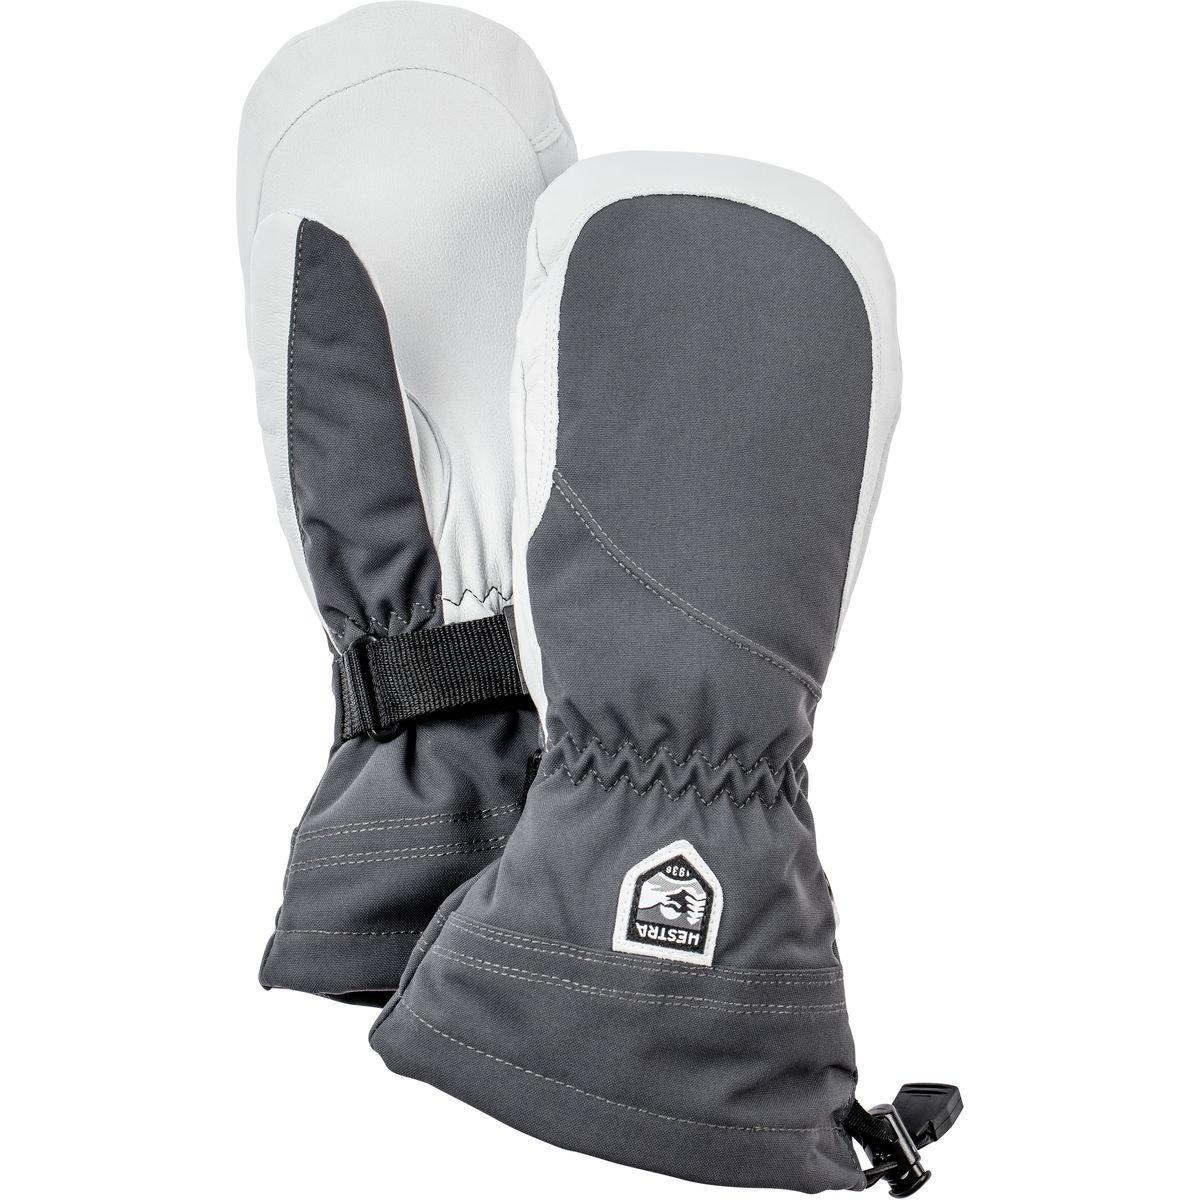 Hestra Women's Heli Mittens, Grey, Size 8